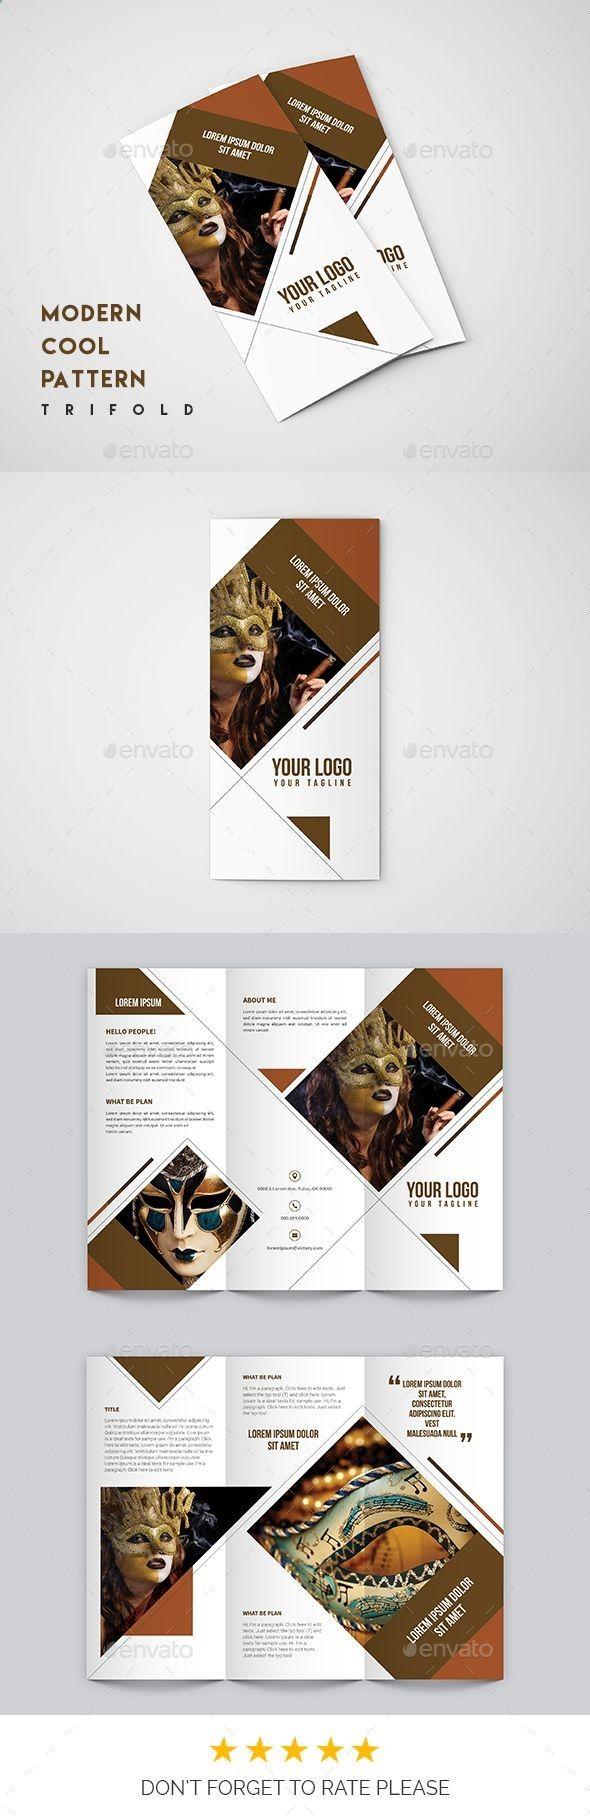 Morden Modern Cool Pattern Trifold Brochure Design Template